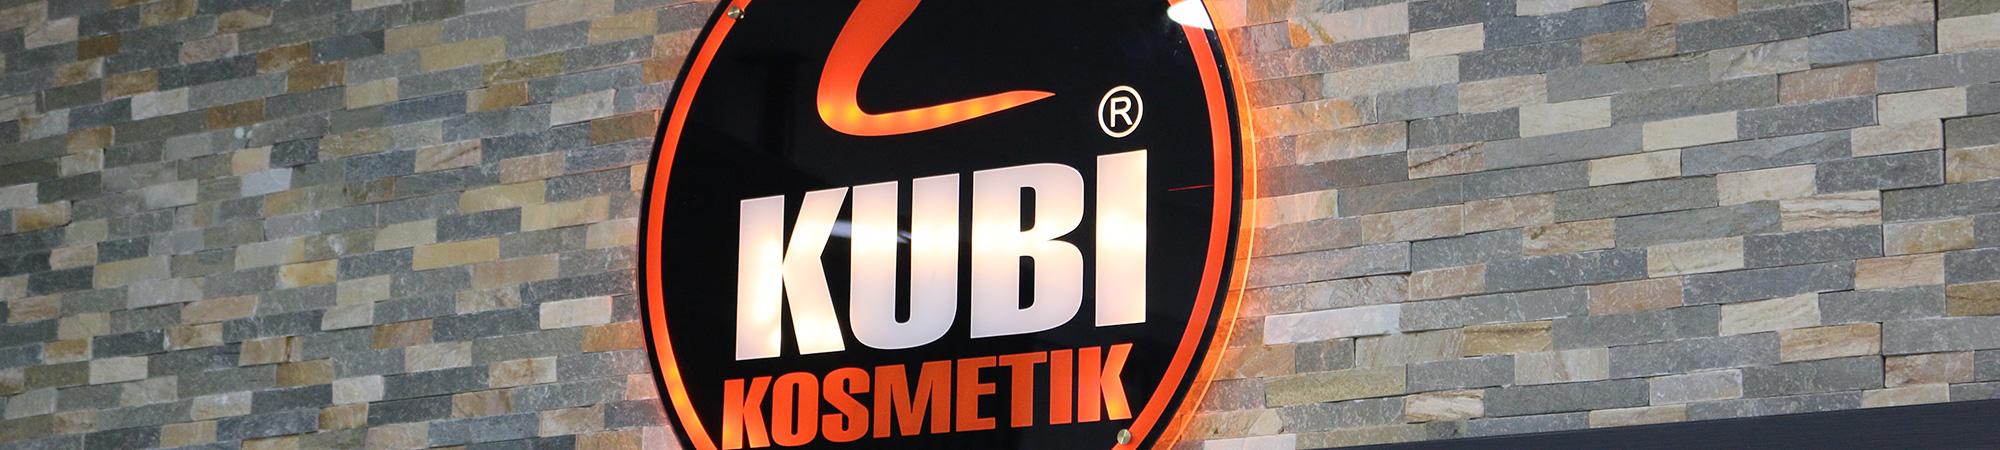 kubi-index-slideshow-1